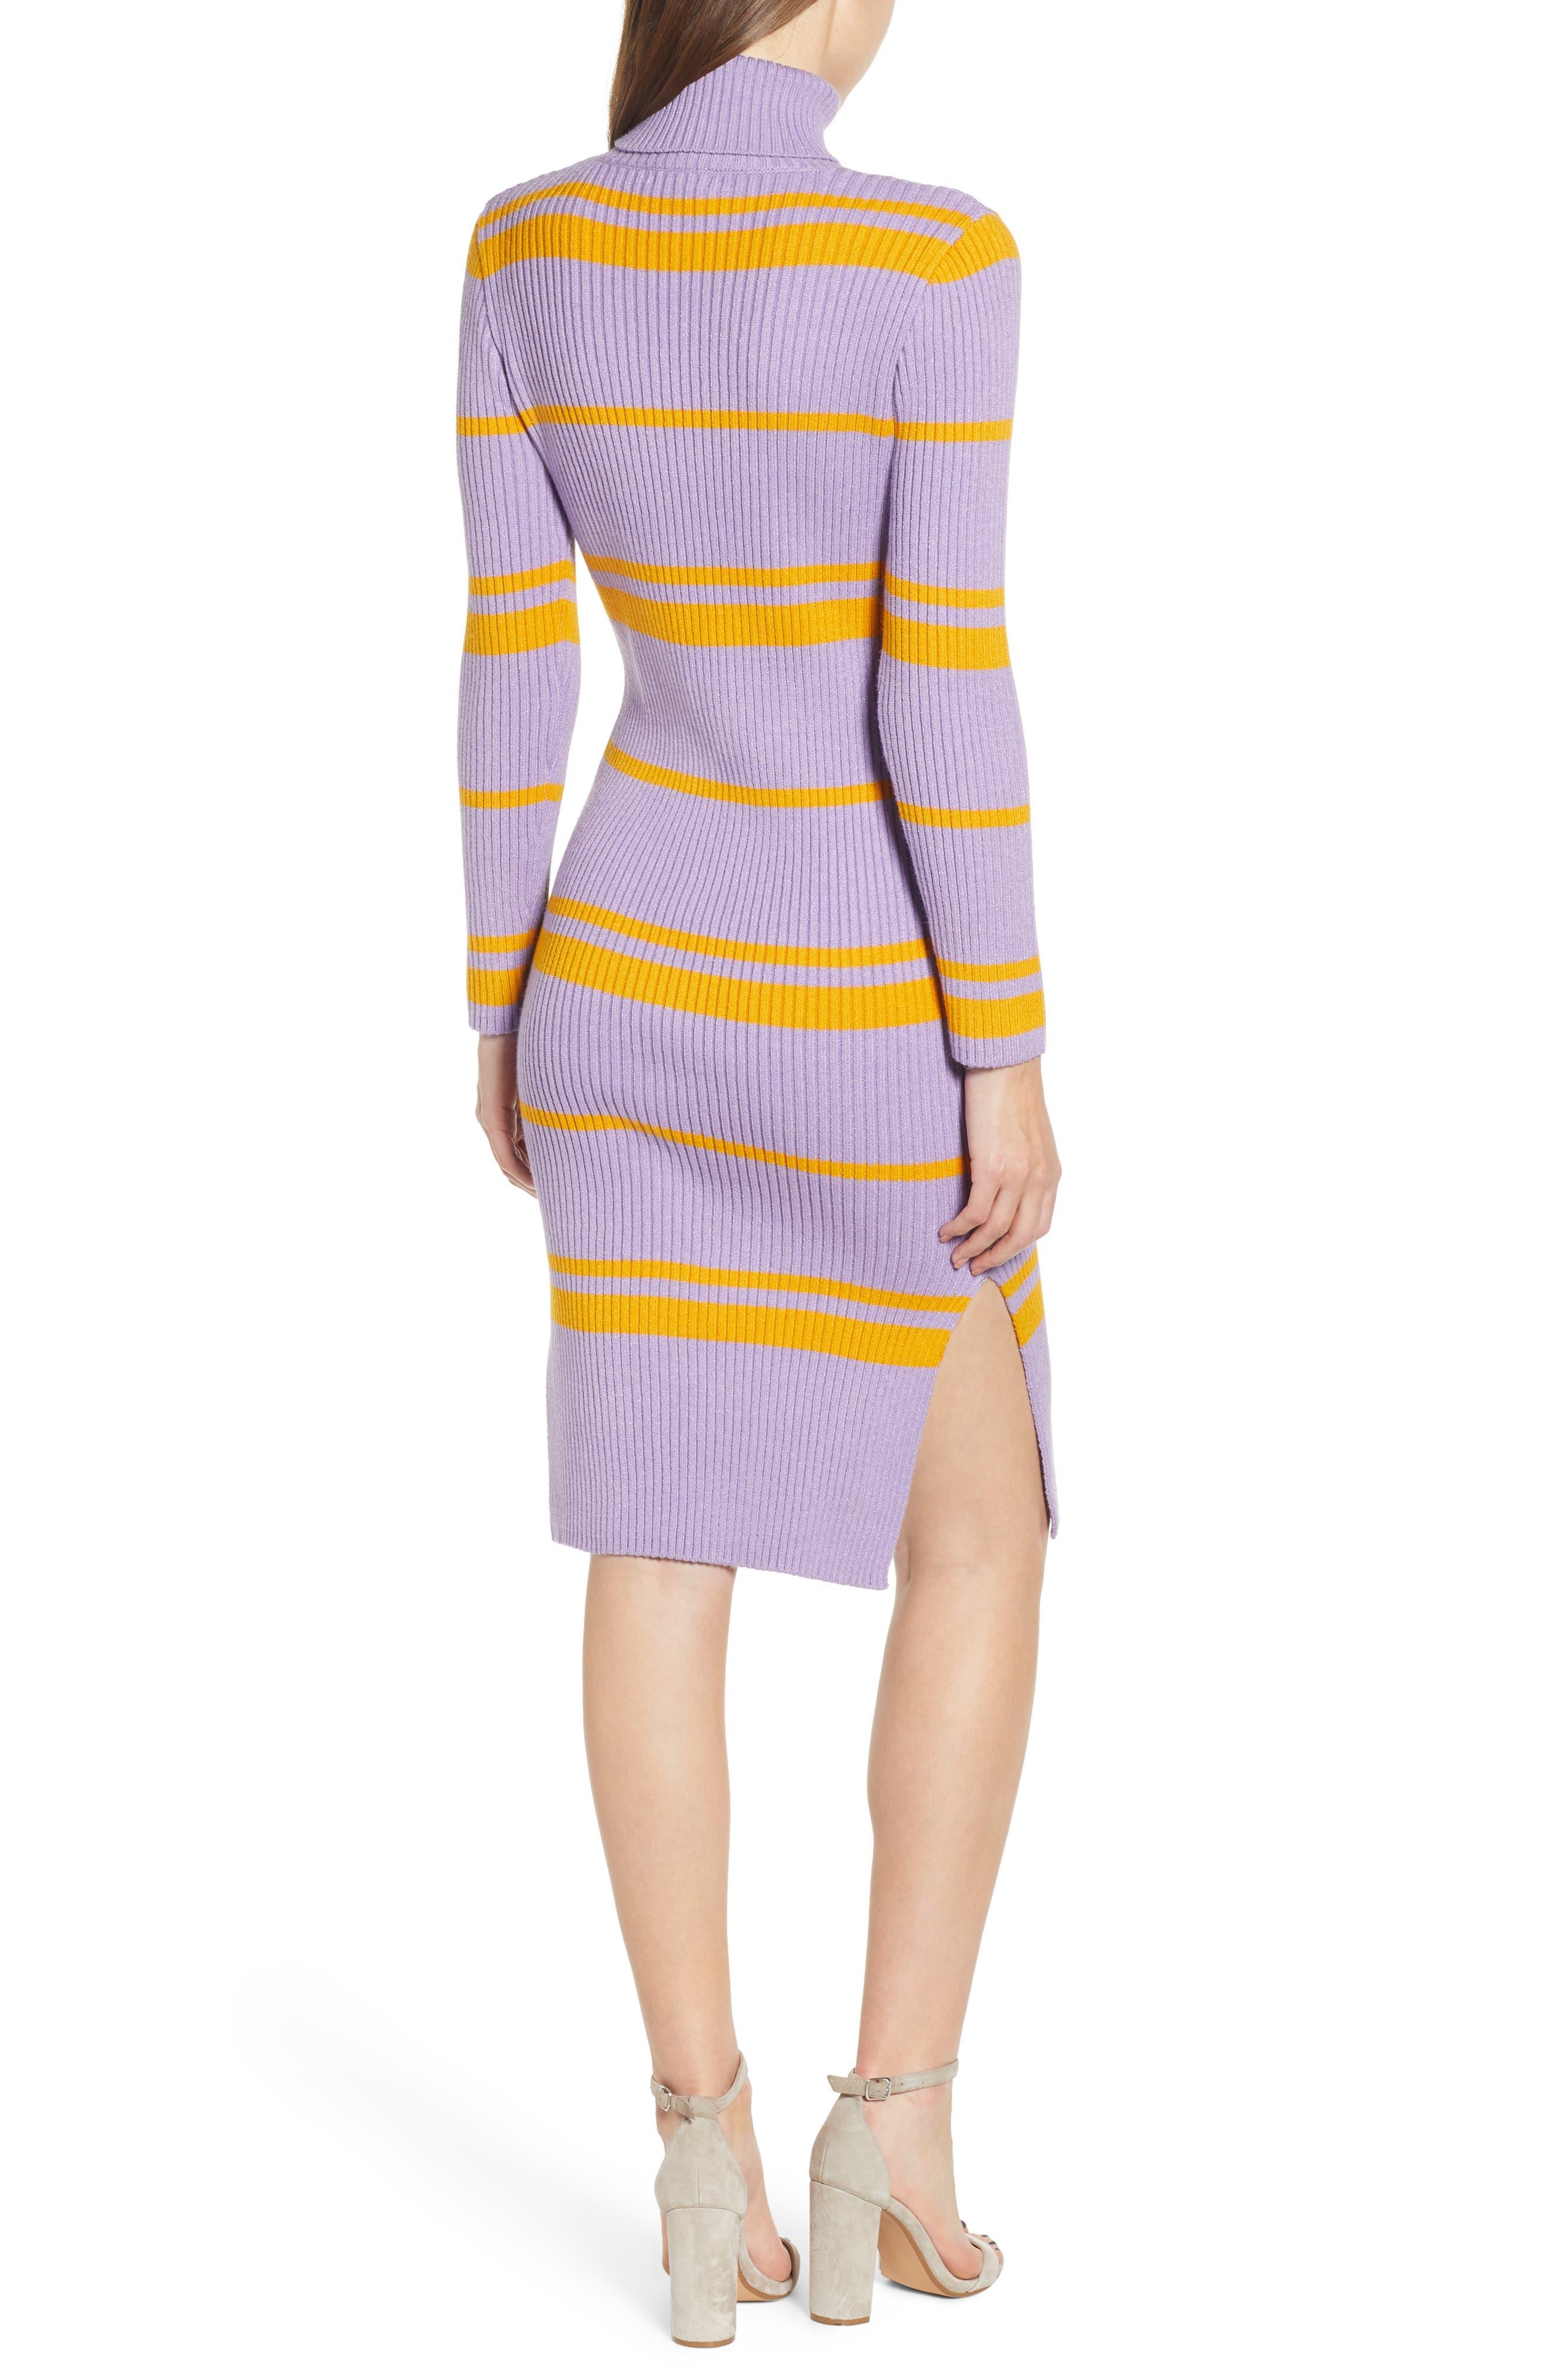 MOON RIVER, Stripe Turtleneck Sweater Dress, Alternate thumbnail 2, color, 500